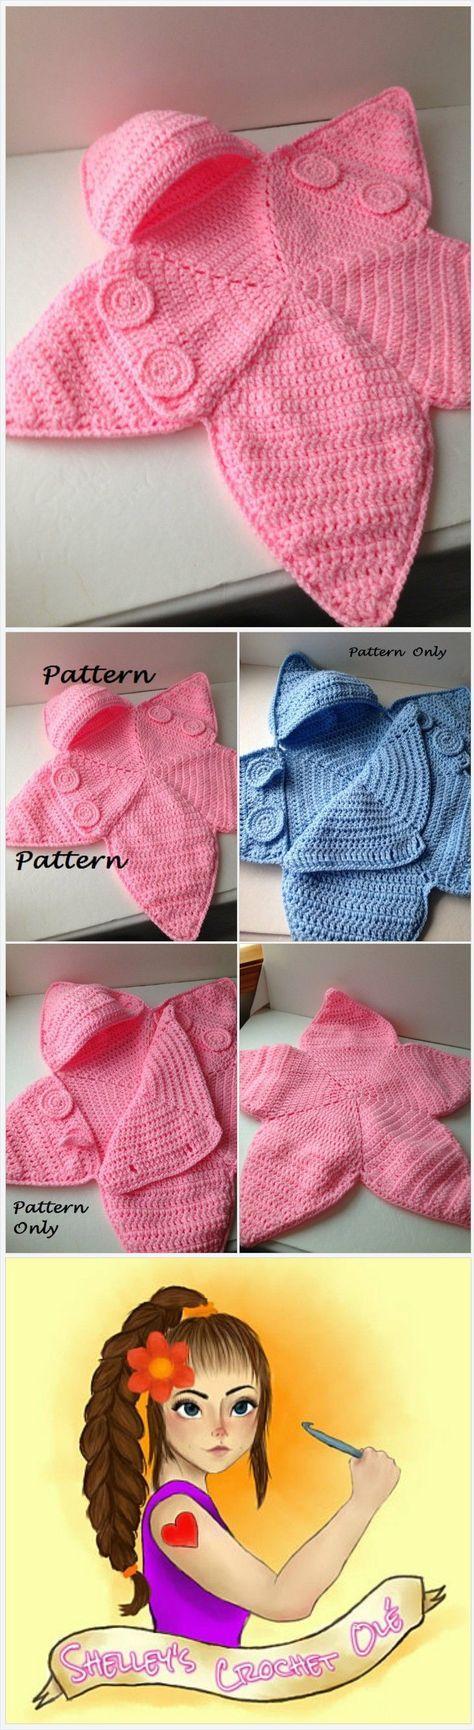 Crochet Newborn Sleep Sack Free Crochet Baby Clothes